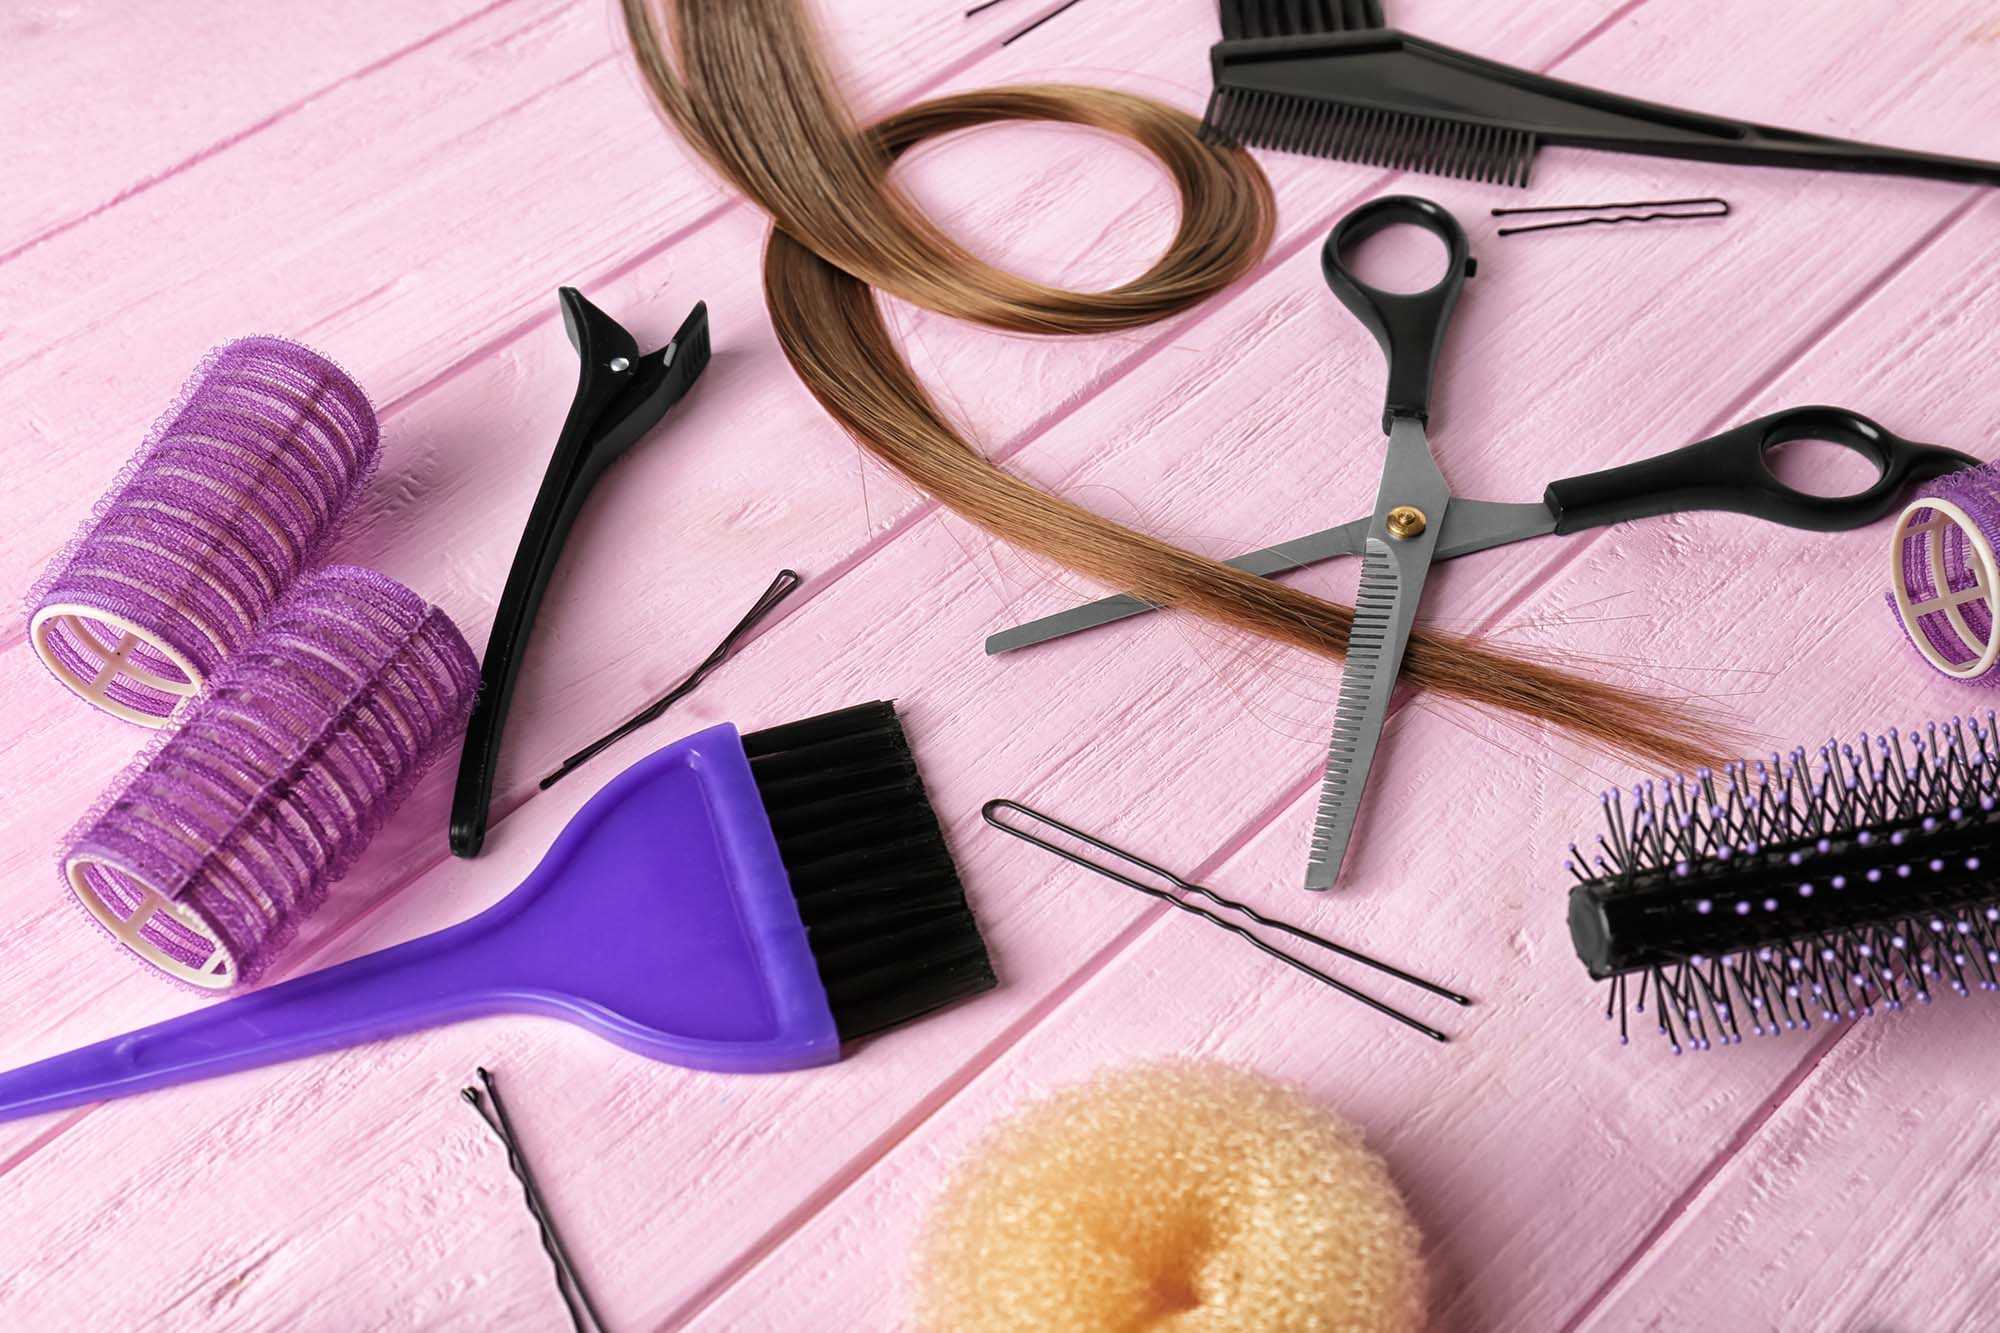 Set of hairdresser's supplies on color wooden background